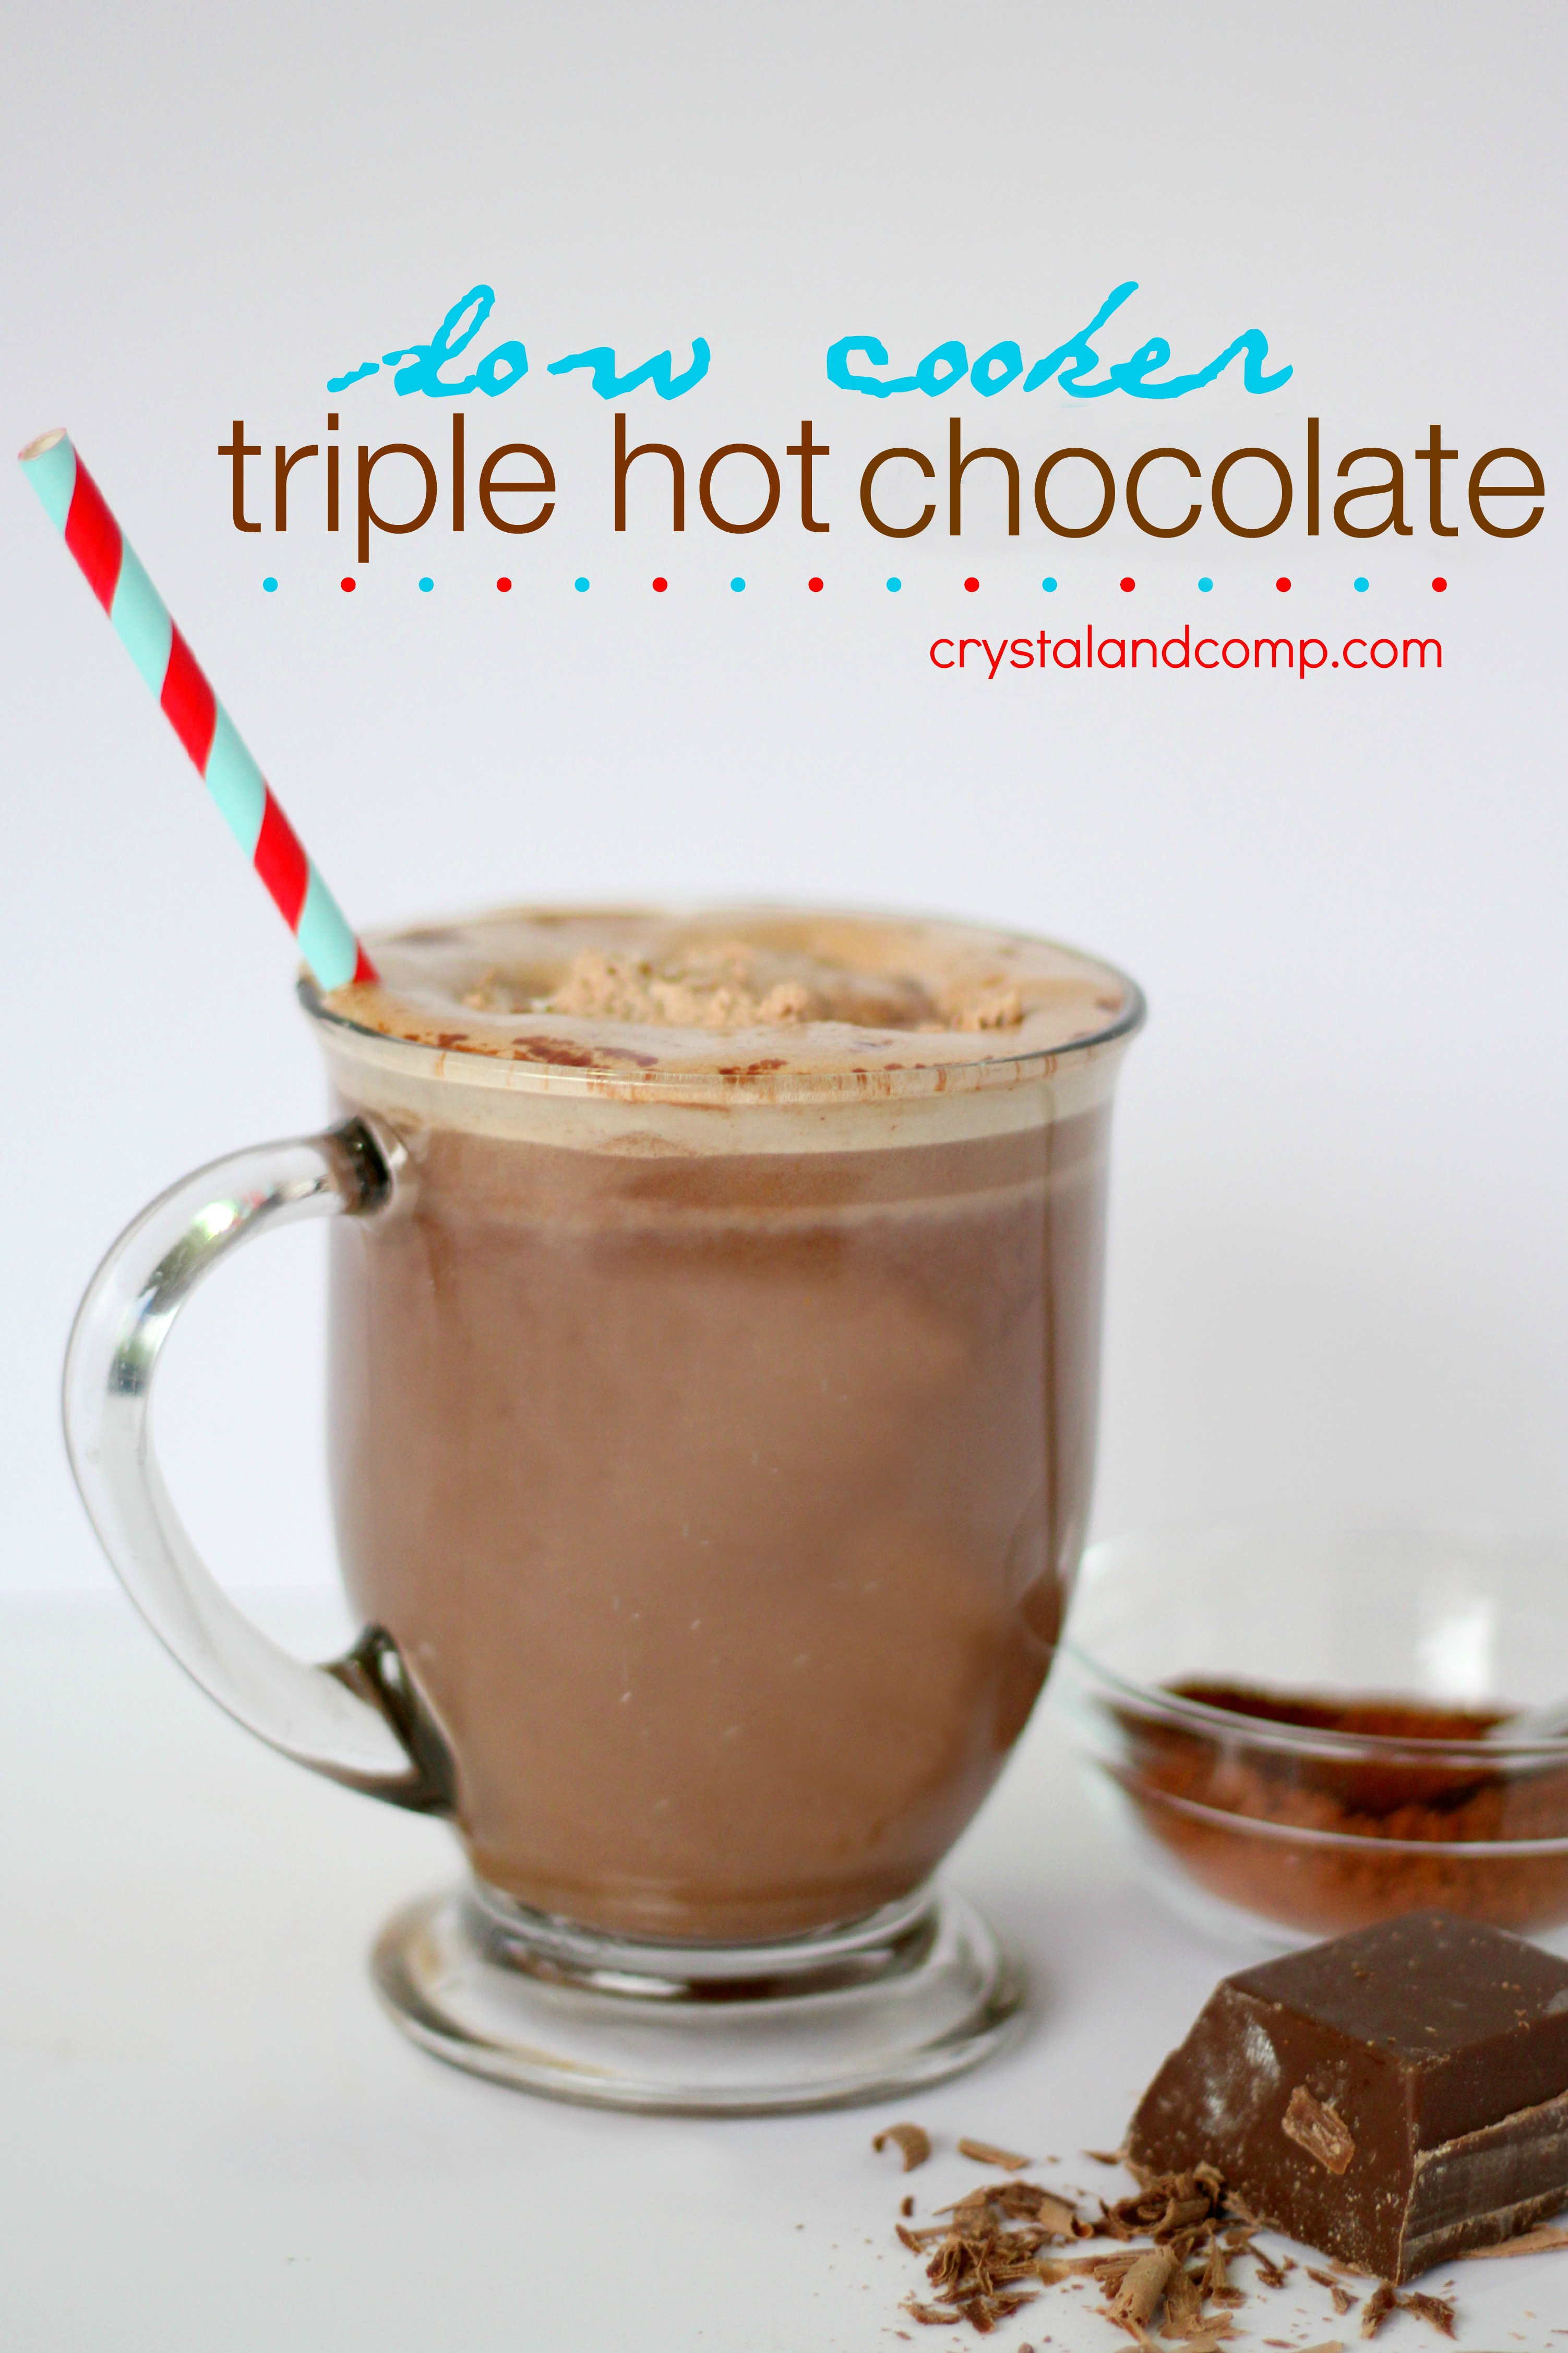 Easy Crockpot Hot Chocolate With Cocoa Powder  Crockpot Hot Chocolate